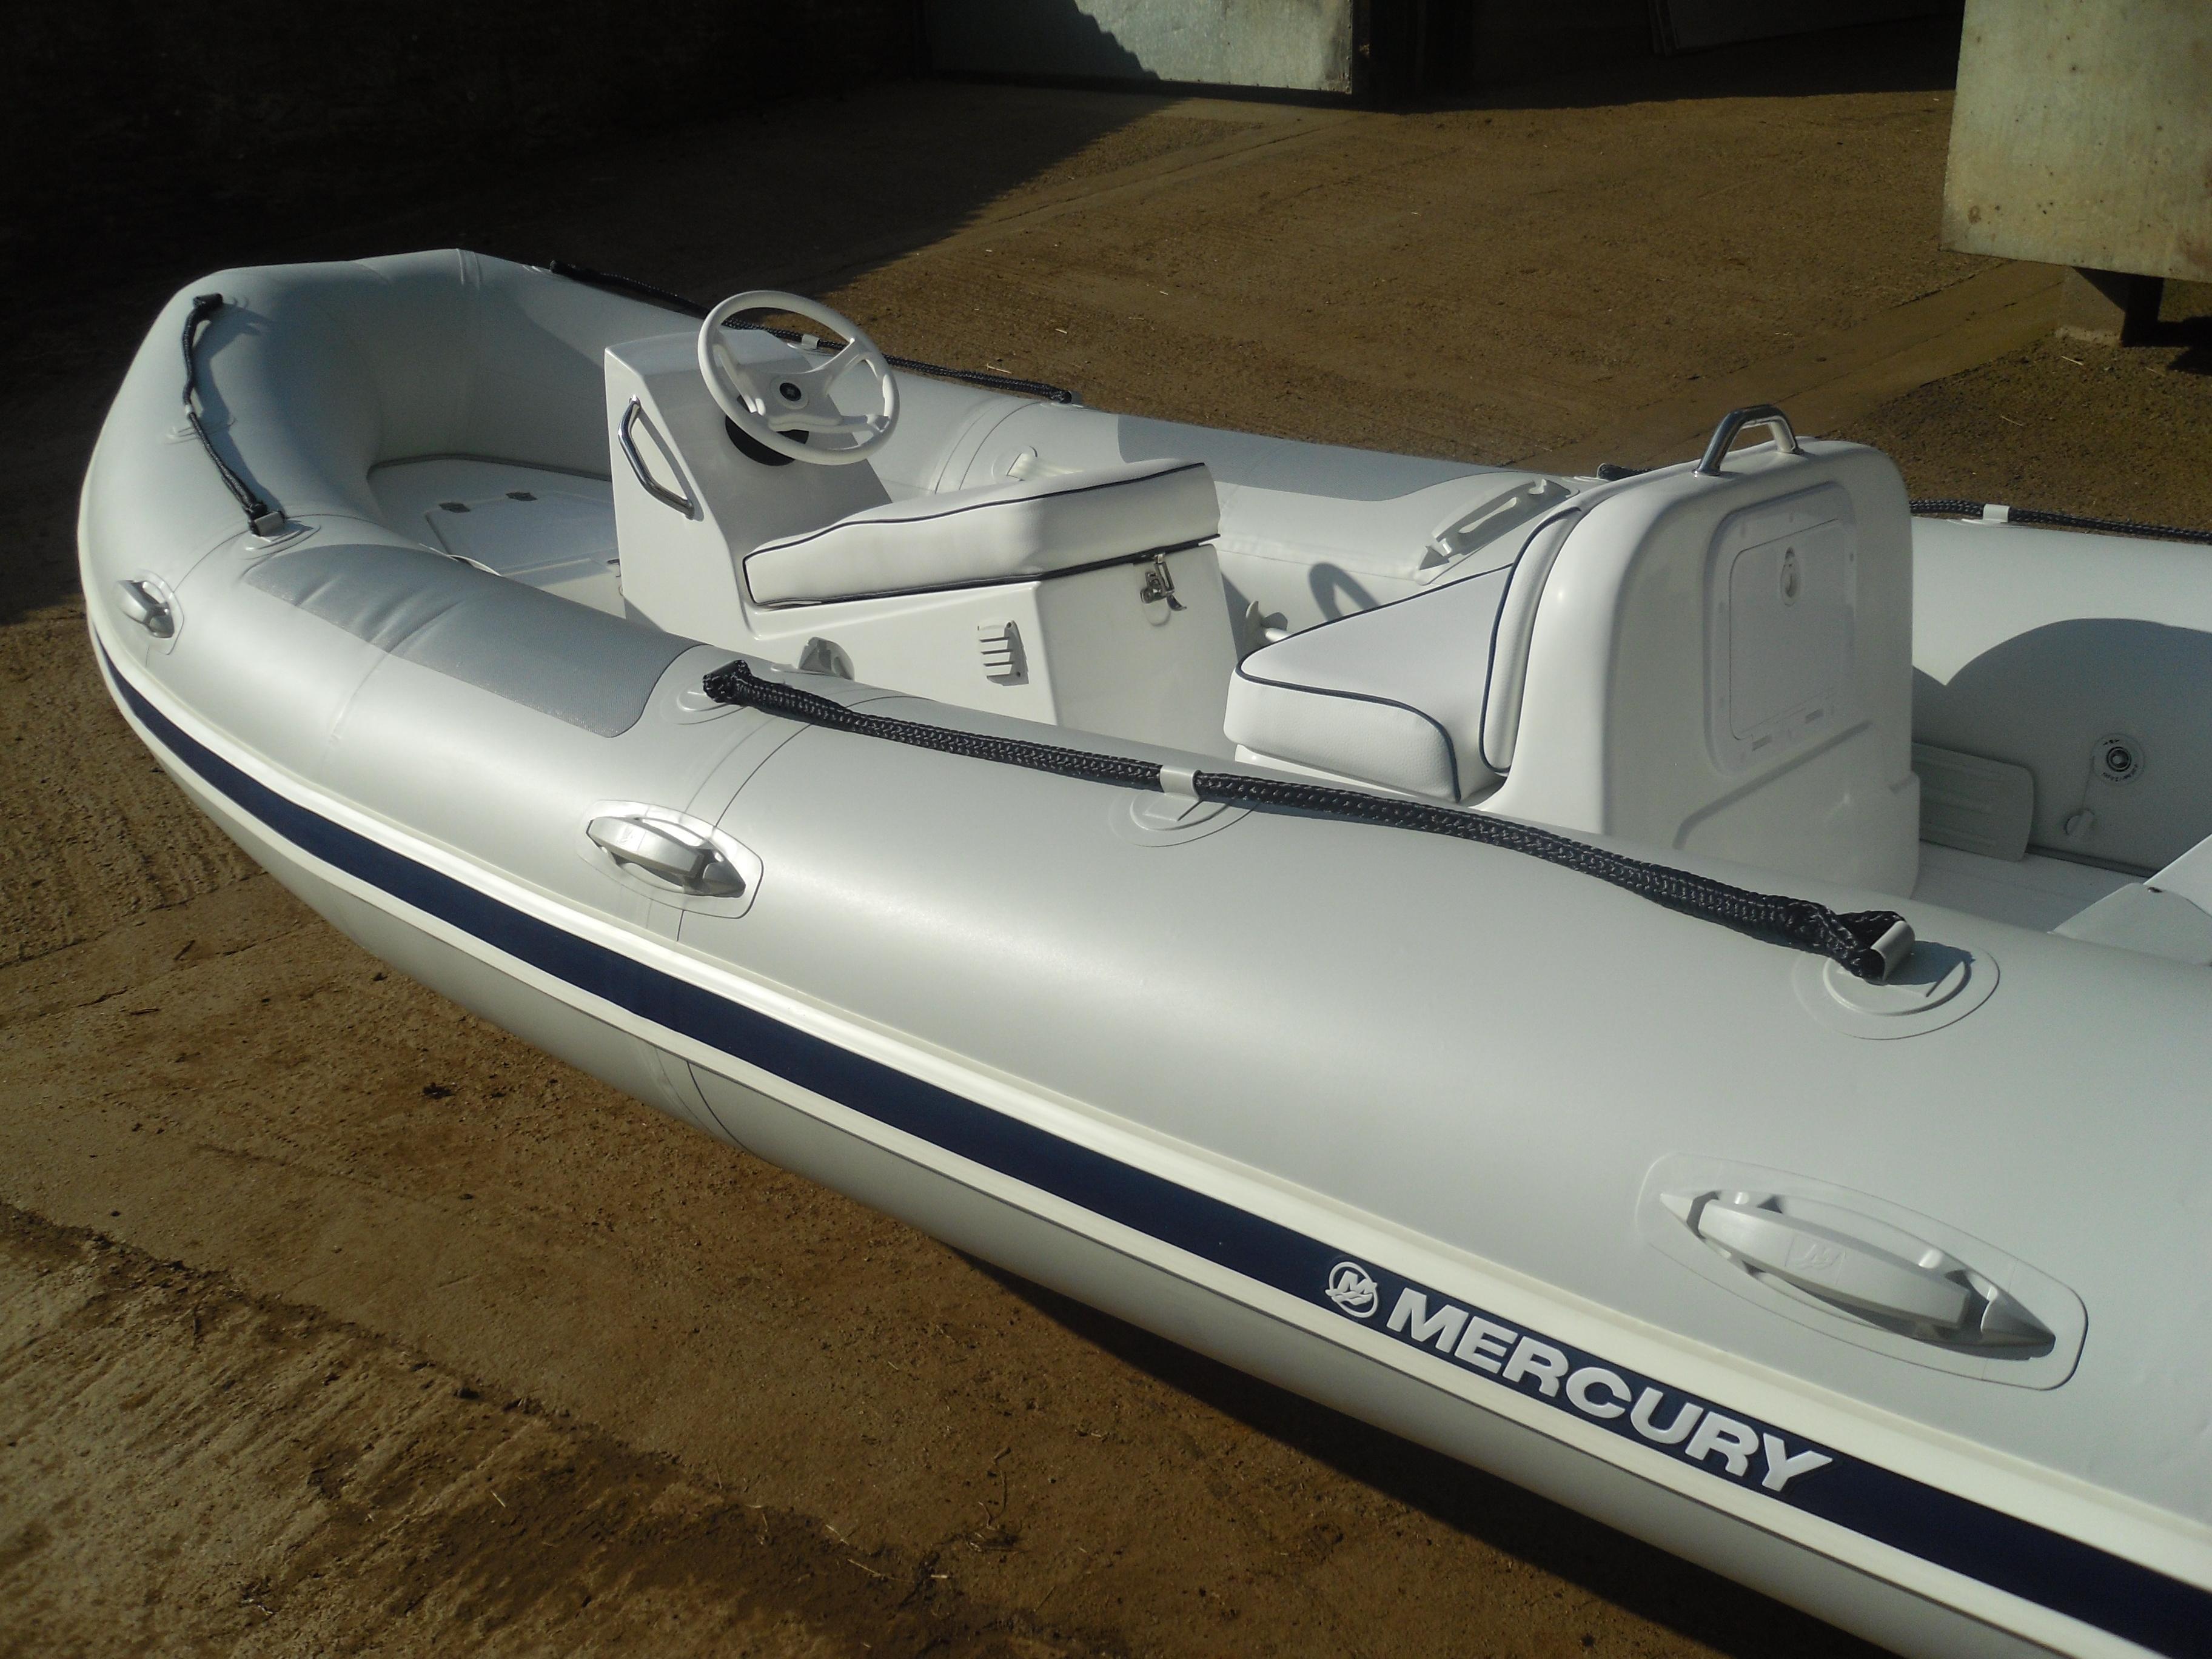 New Mercury Ocean Runner 460 With Mariner 40 Four Stroke